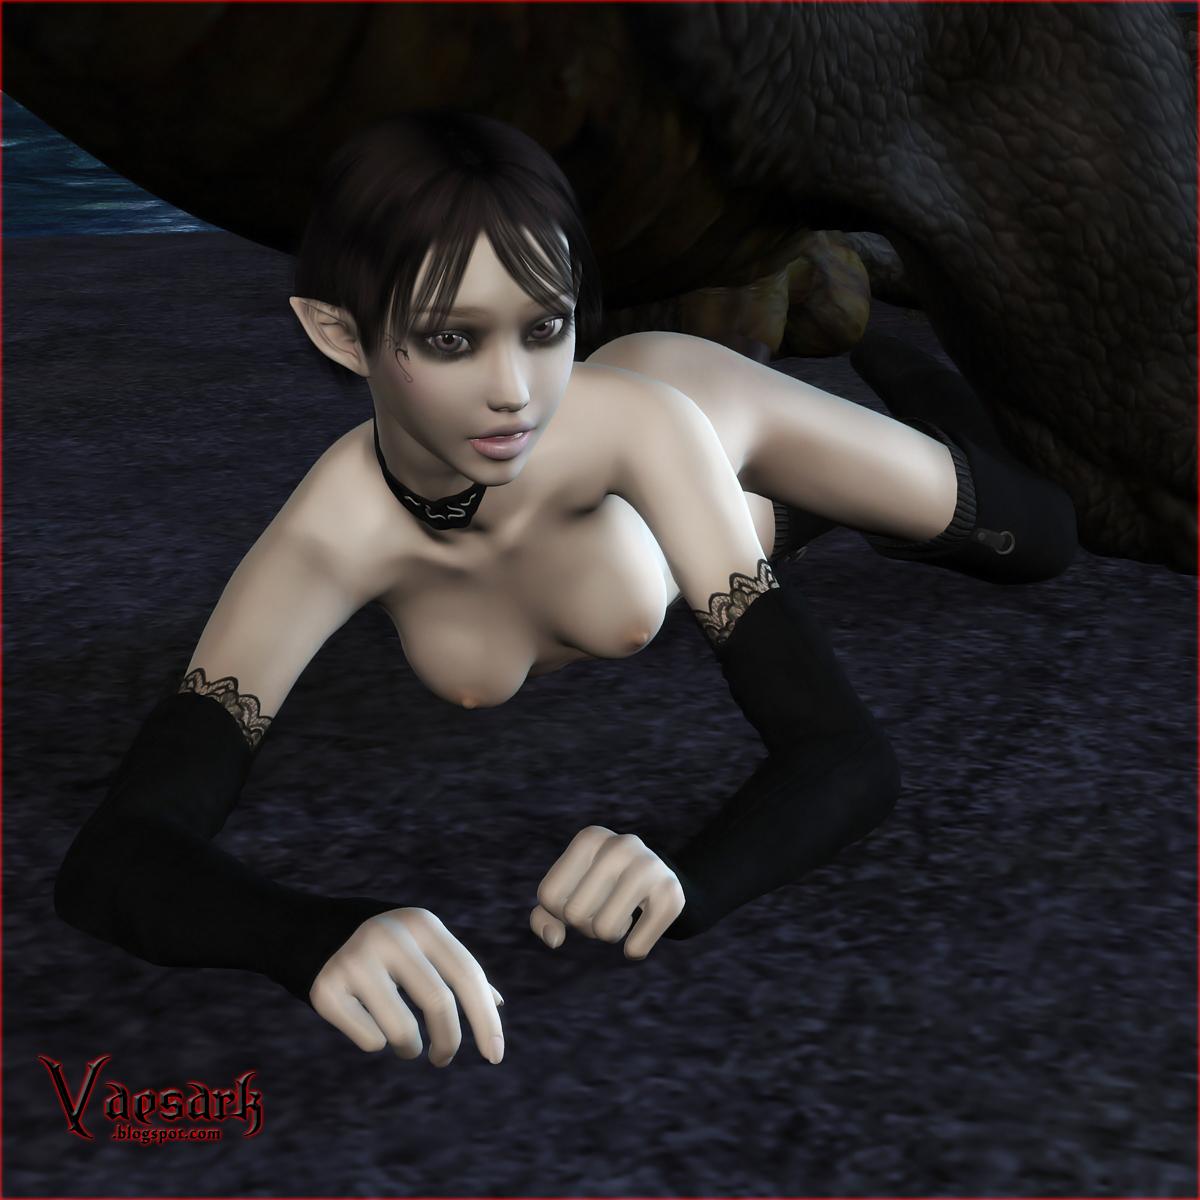 Hd water sex video pron image